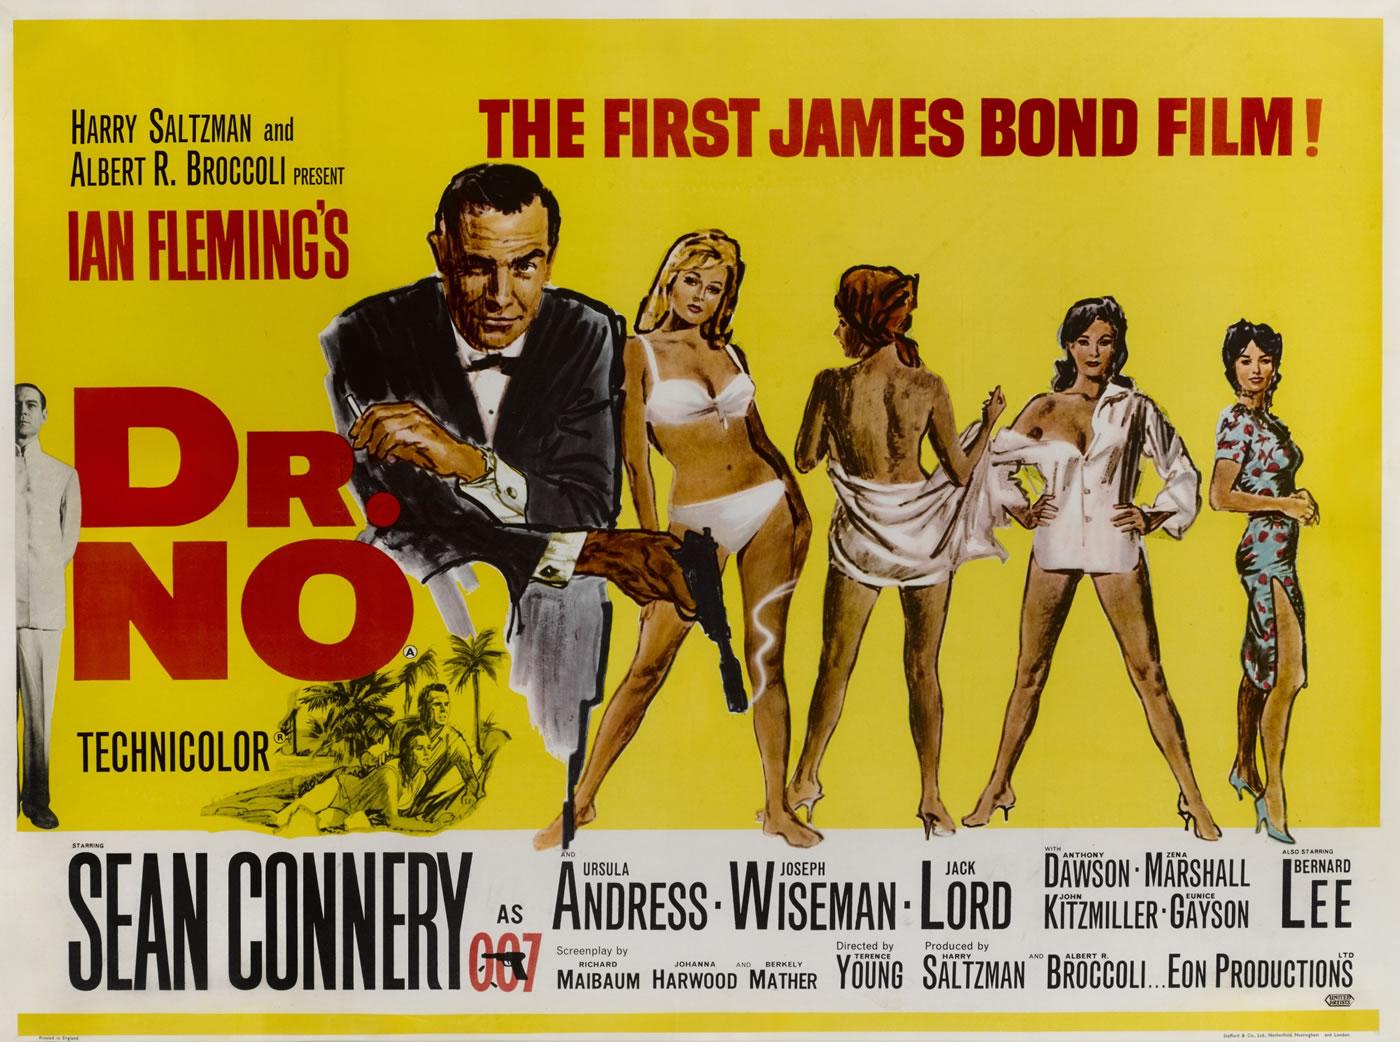 https://luxurylaunches.com/wp-content/uploads/2019/06/First-James-Bond-film-poster-sells.jpg